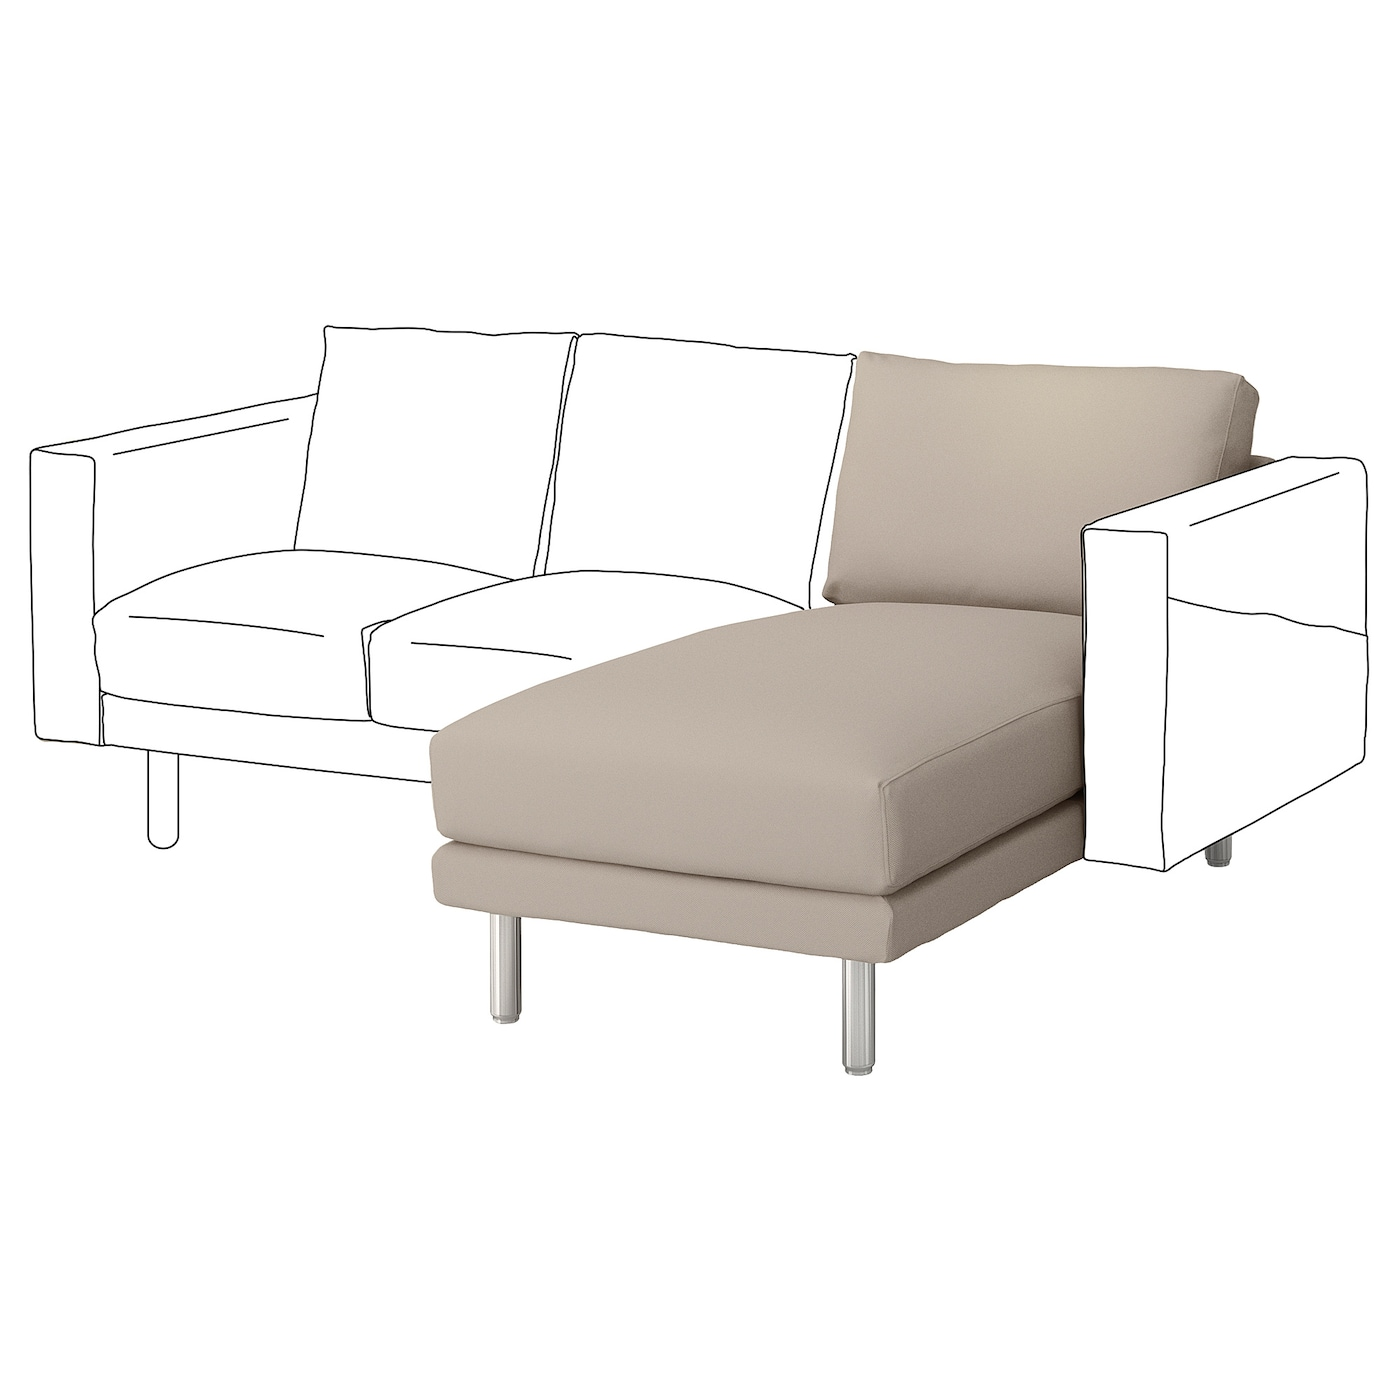 norsborg chaise longue section gr sbo beige metal ikea. Black Bedroom Furniture Sets. Home Design Ideas